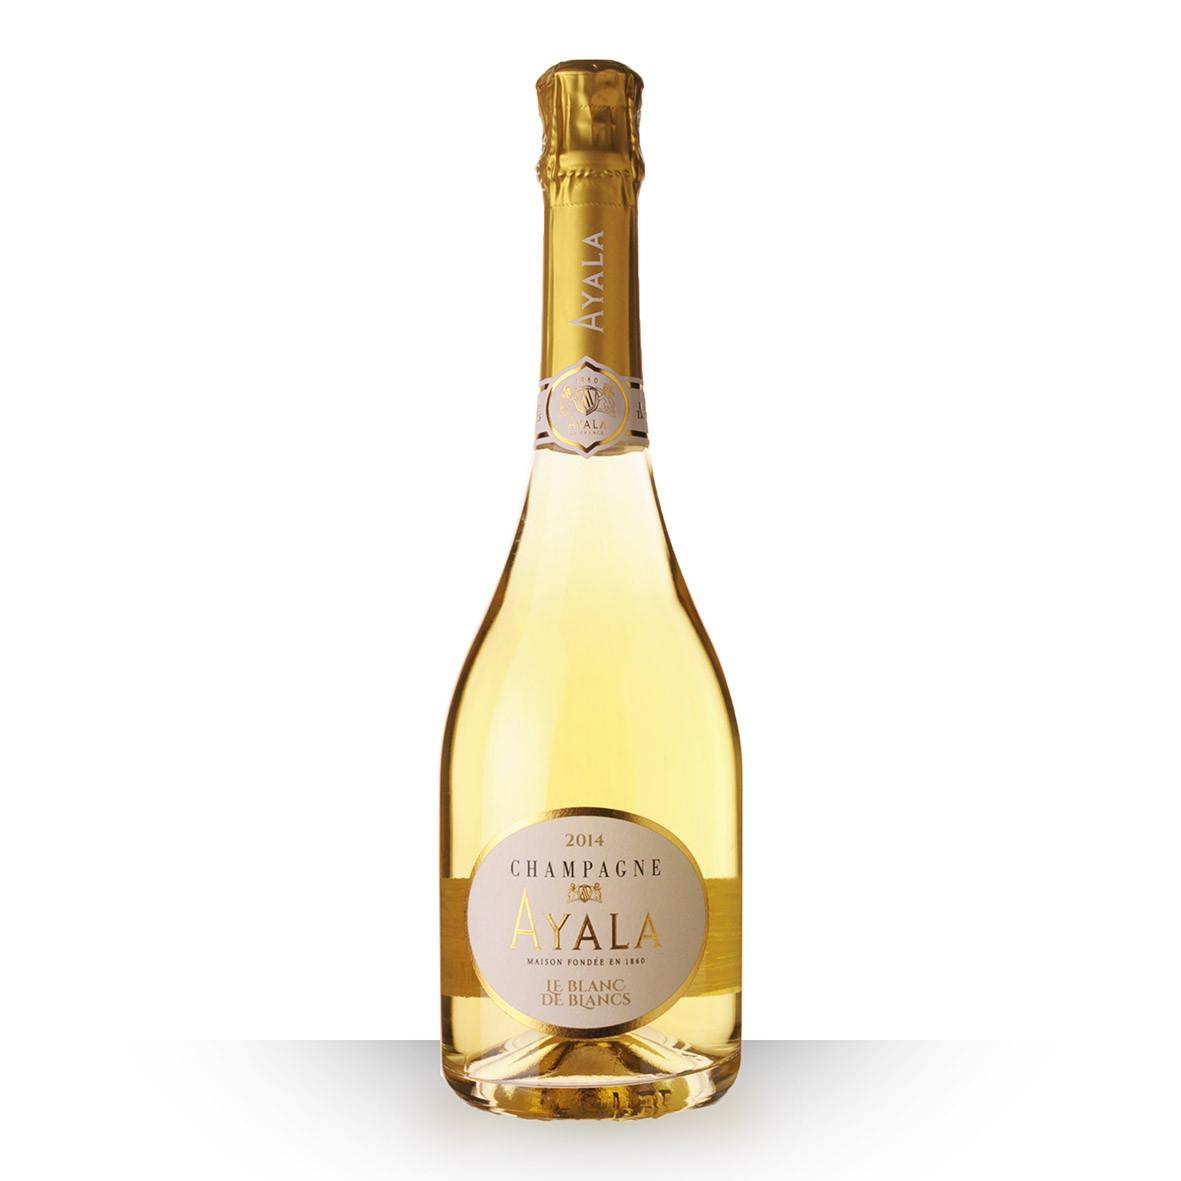 Champagne Ayala Blanc de Blancs 2014 75cl www.odyssee-vins.com